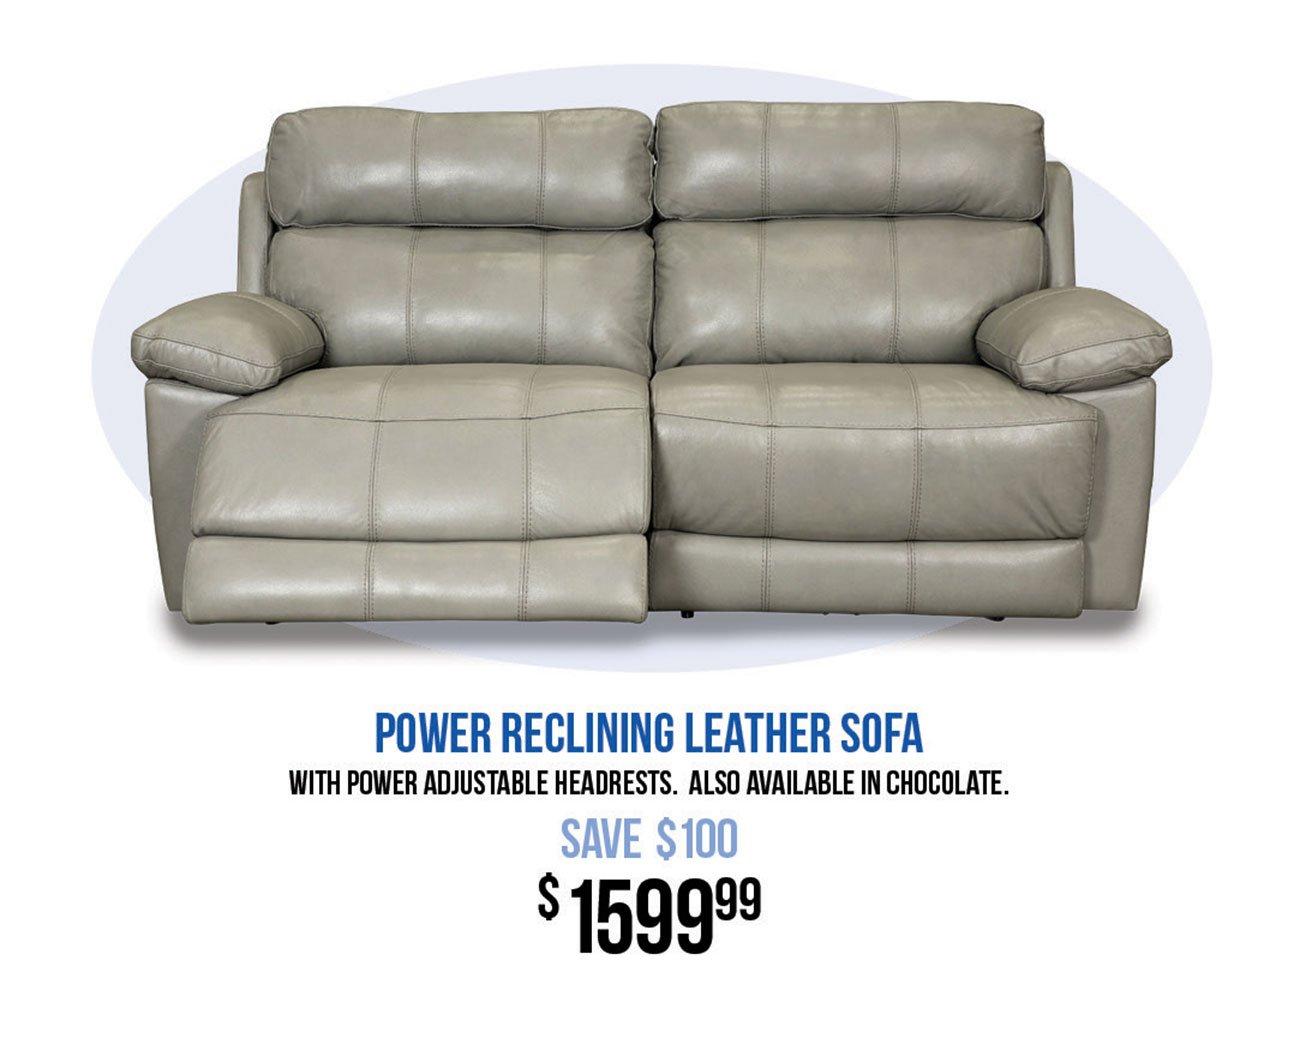 Power-Reclining-Stone-Leather-Sofa